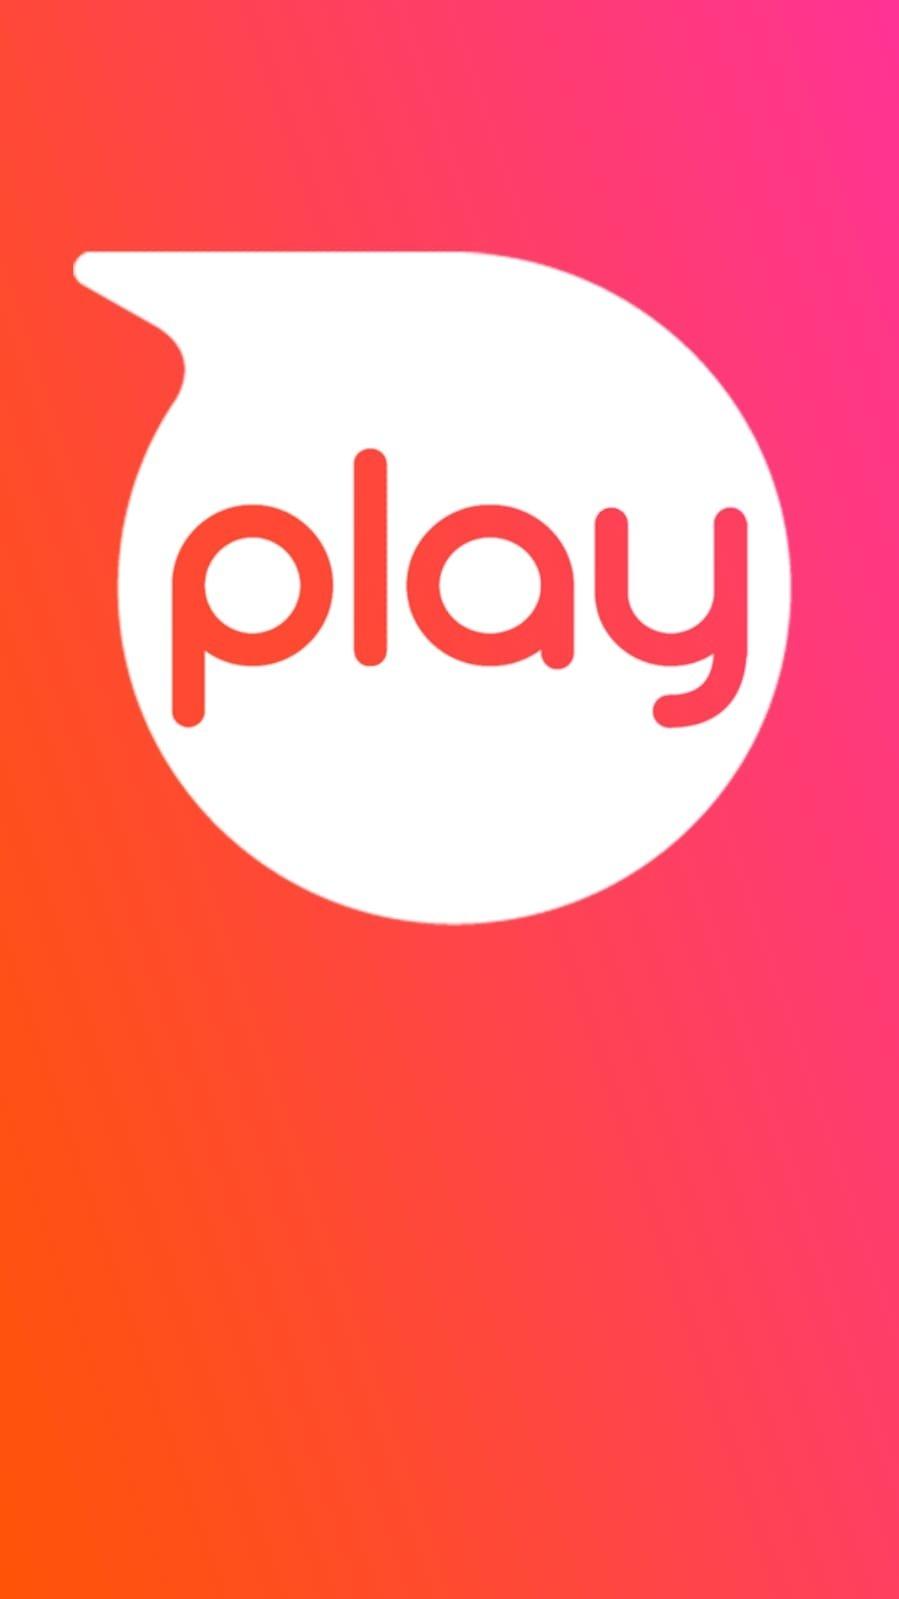 Sphero Android image 4